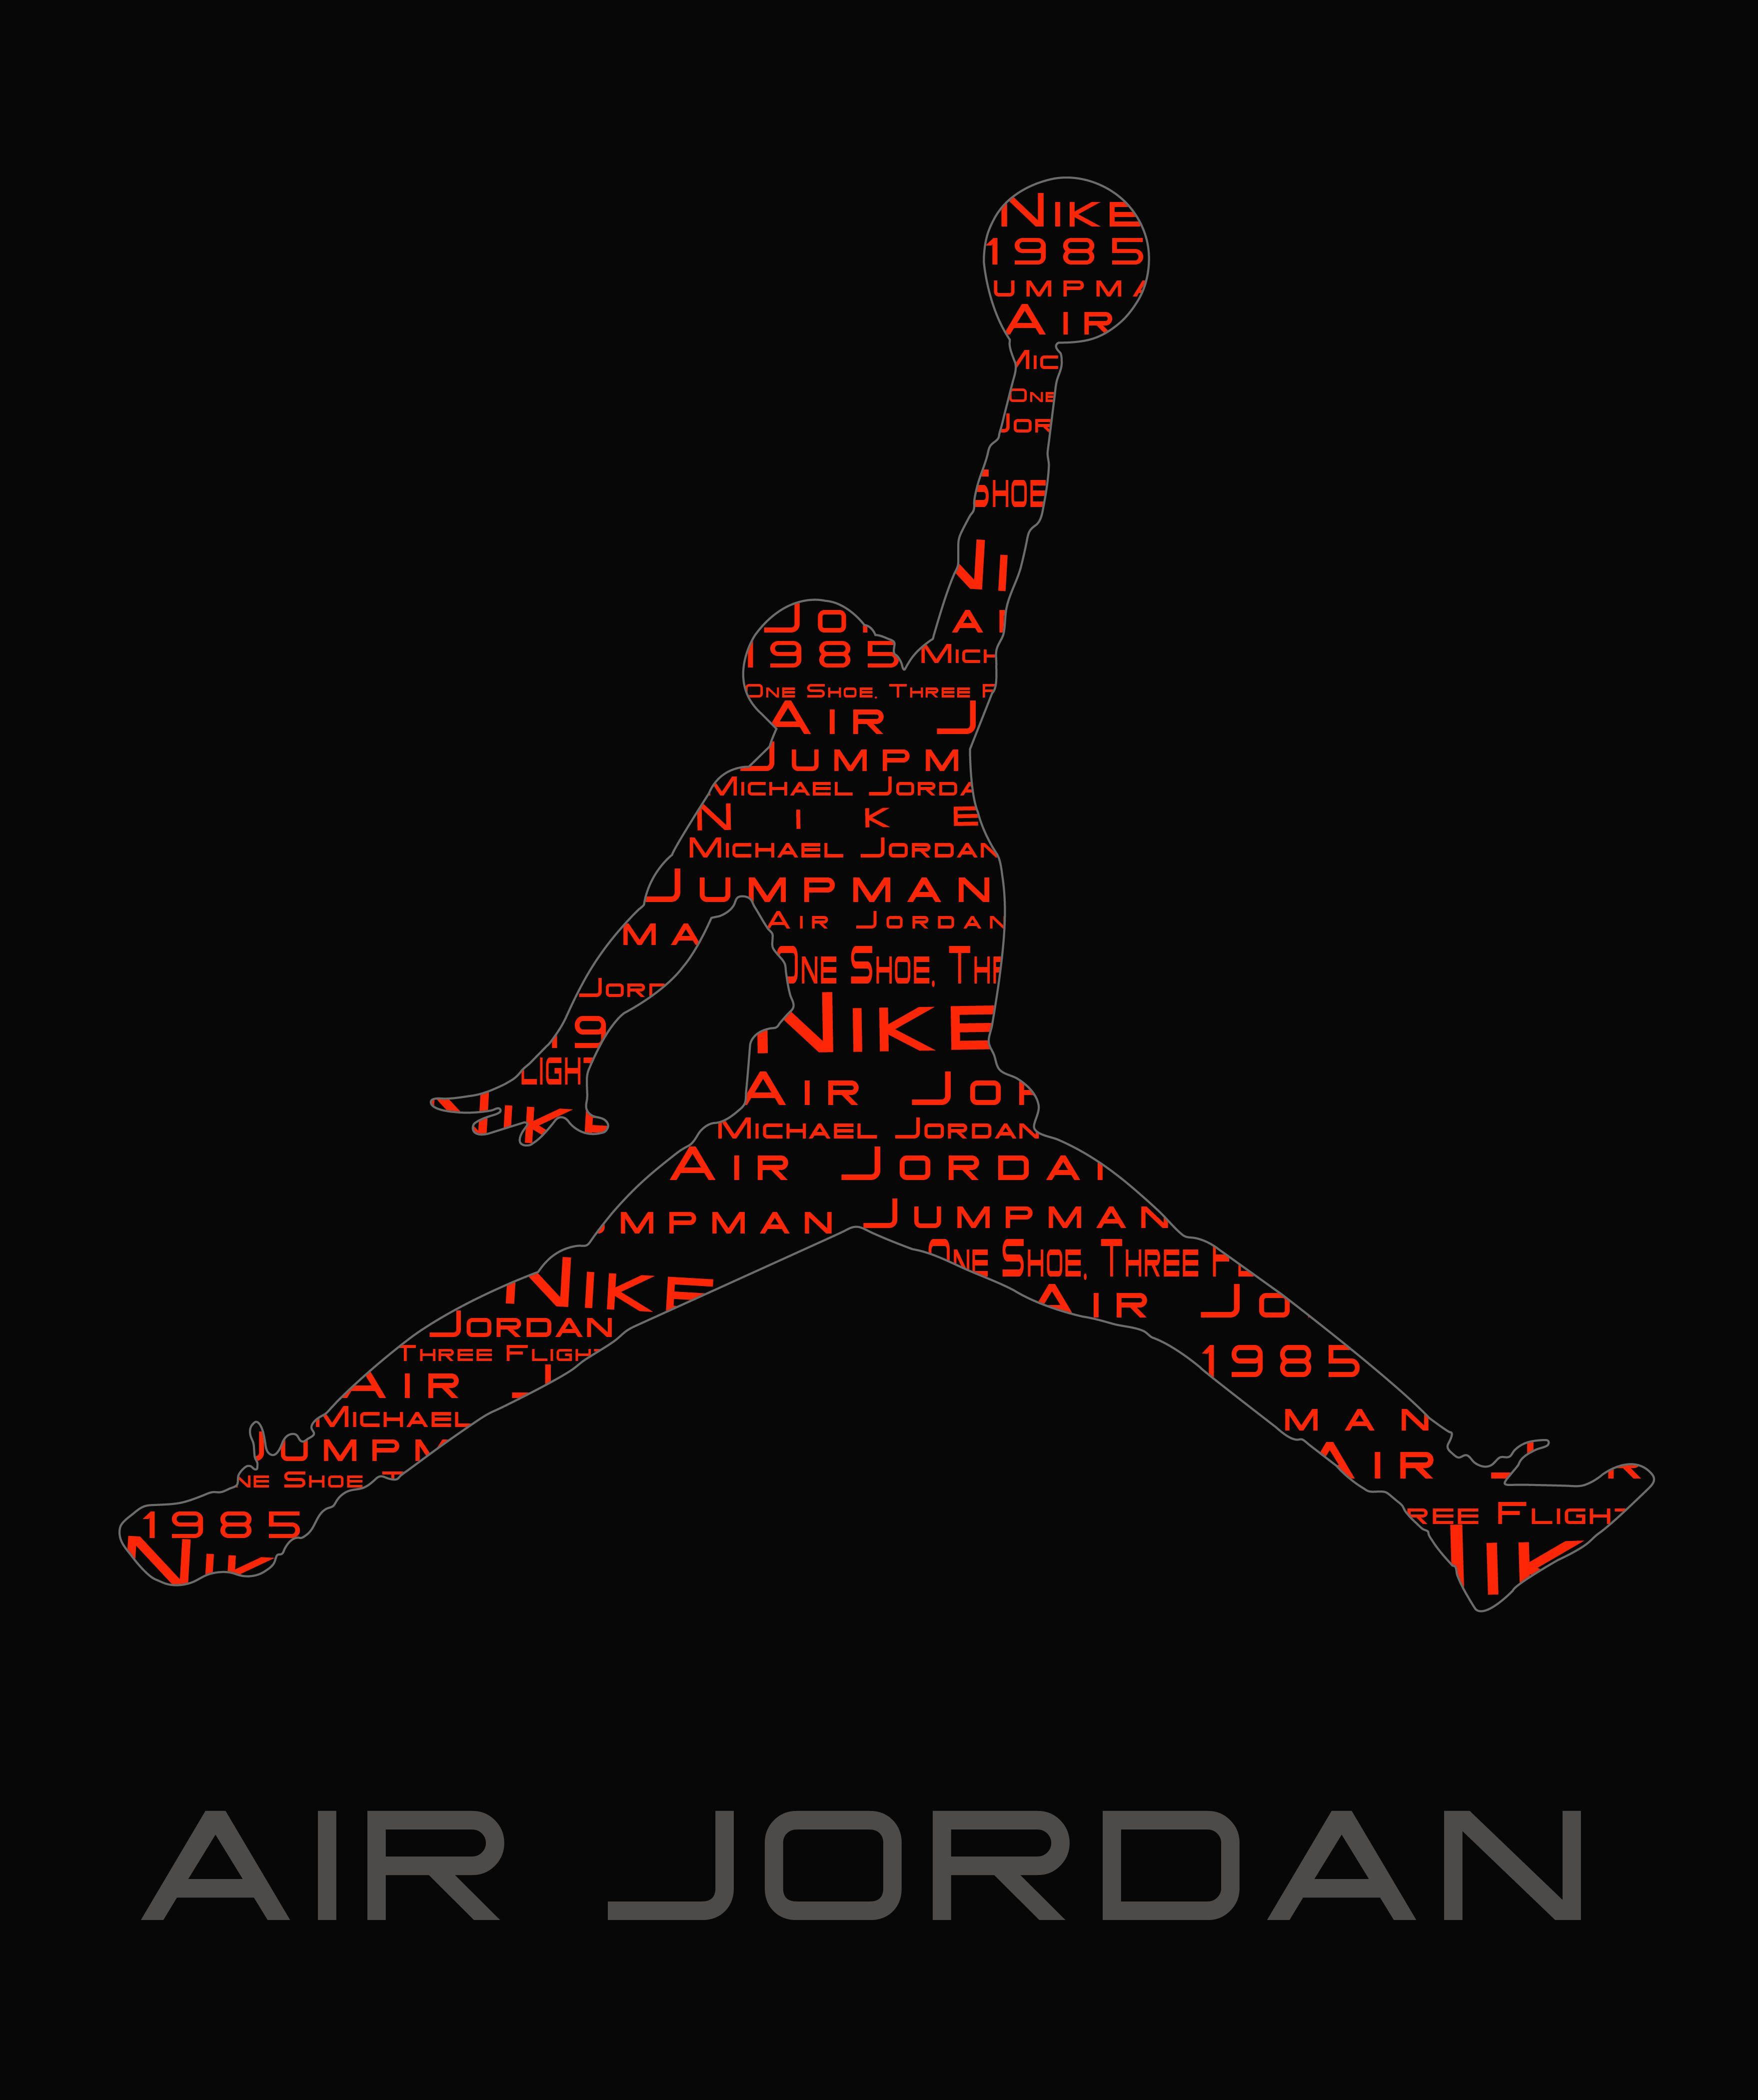 Fantastic Wallpaper Logo Jordan - jN2SKm1  Photograph_249369.jpg